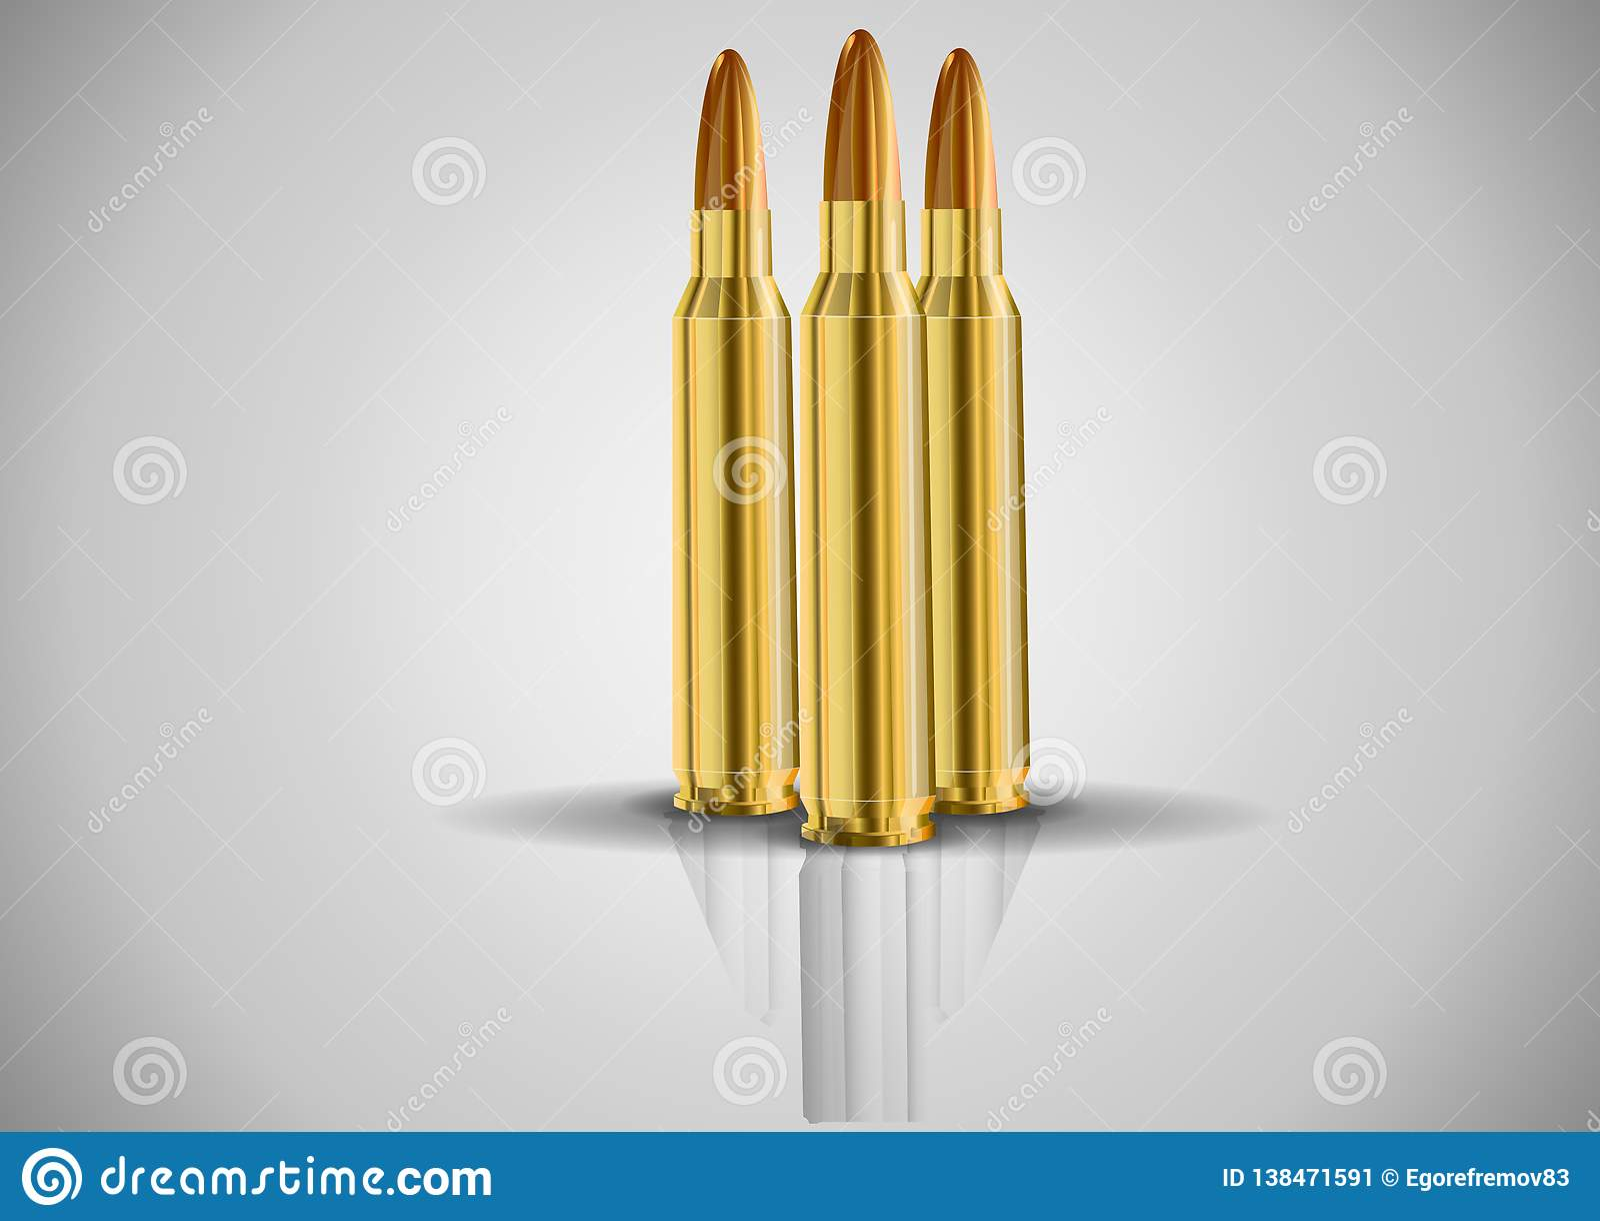 Stylish cartridge.live cartridge.Vector image of a set of ammunition.